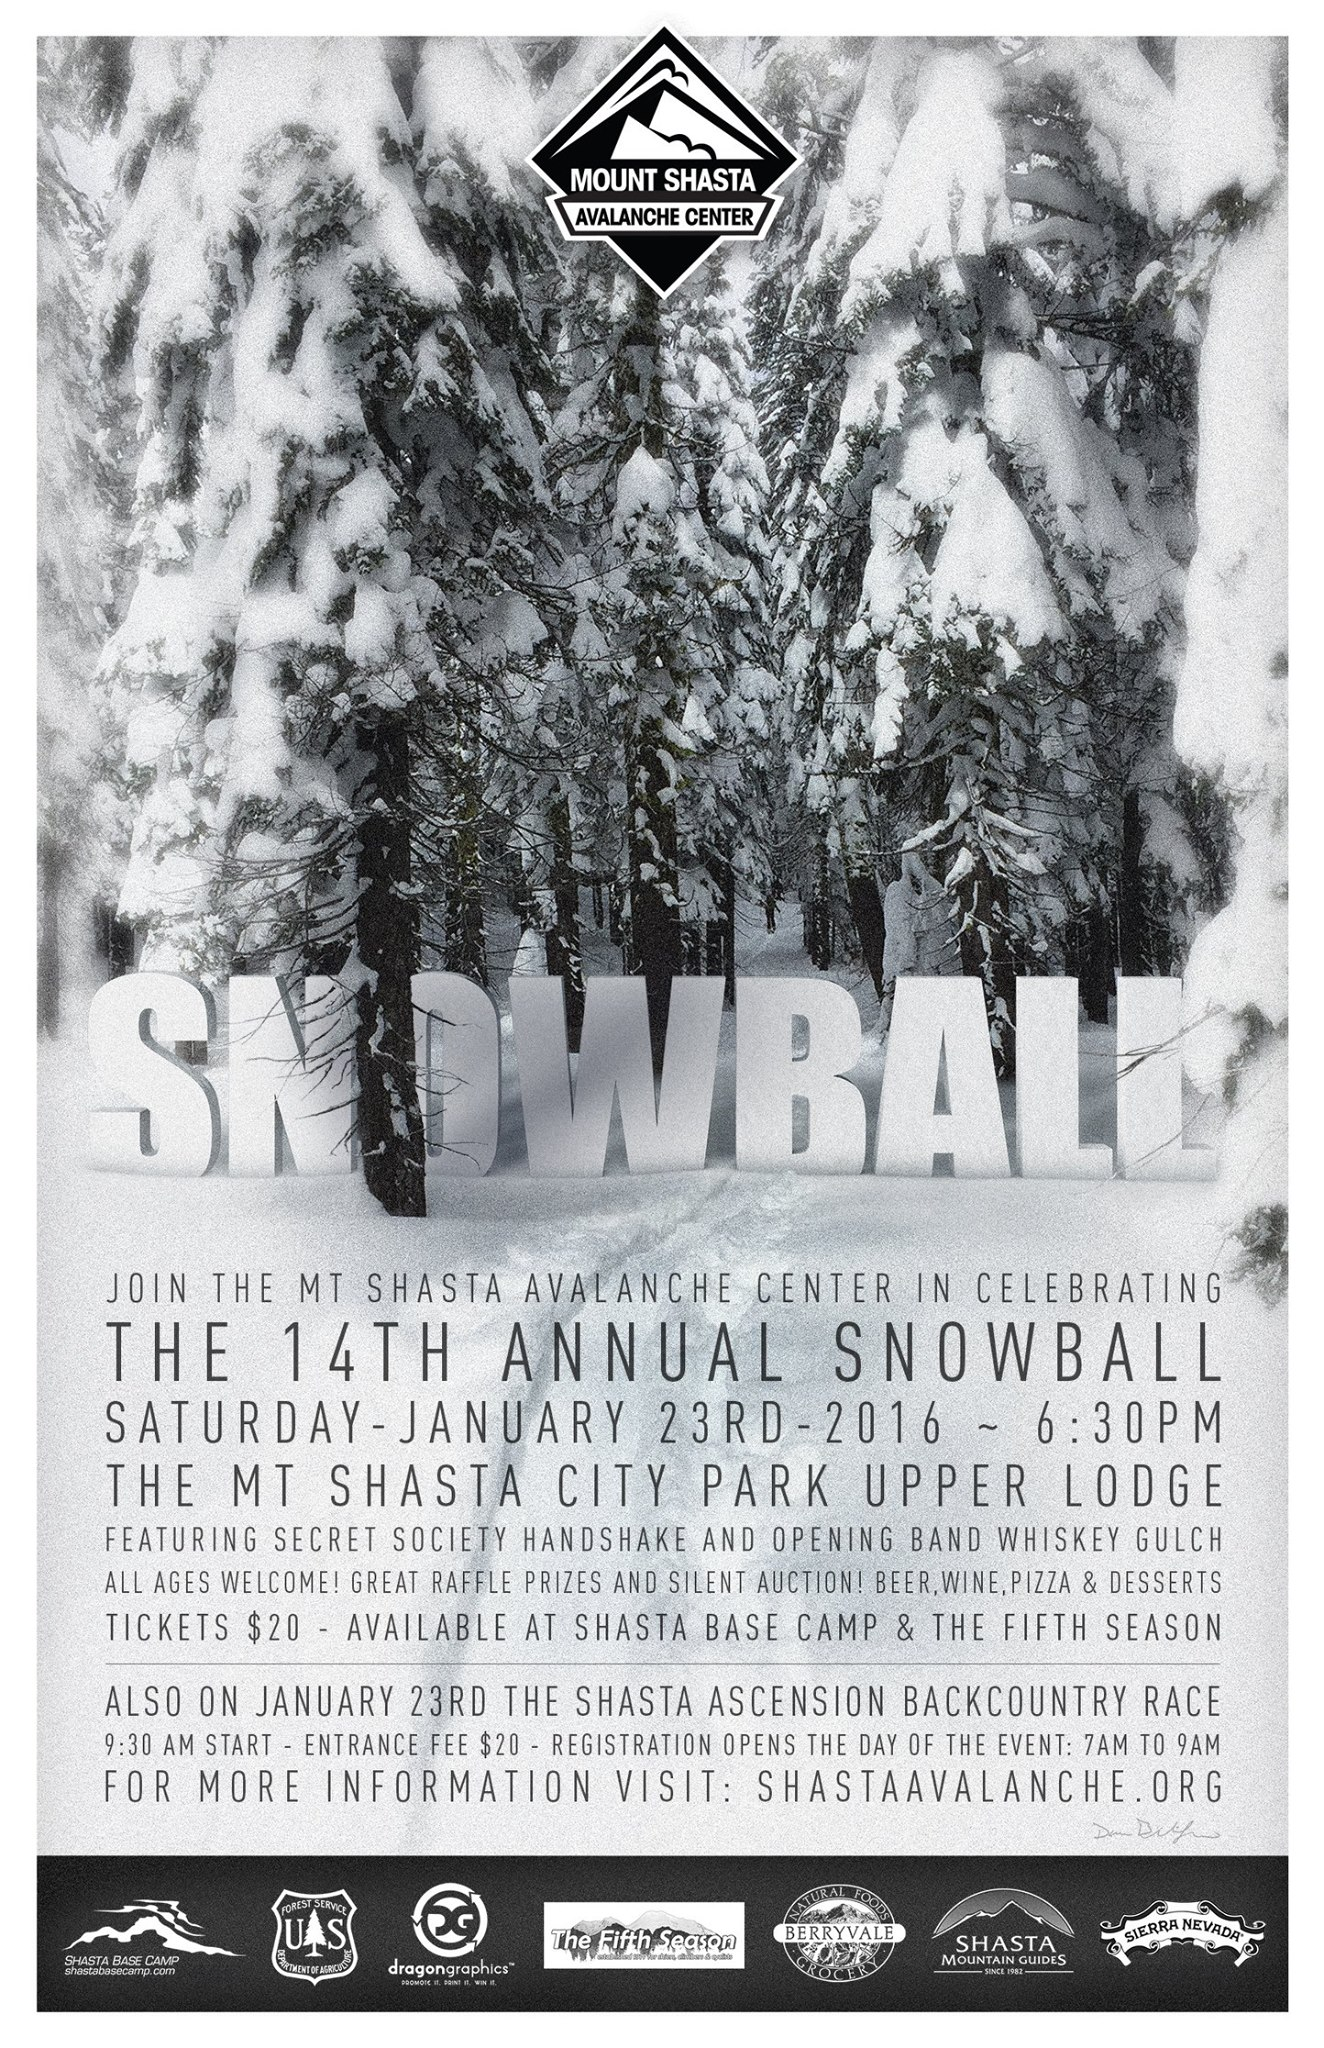 Mt. Shasta Snowball